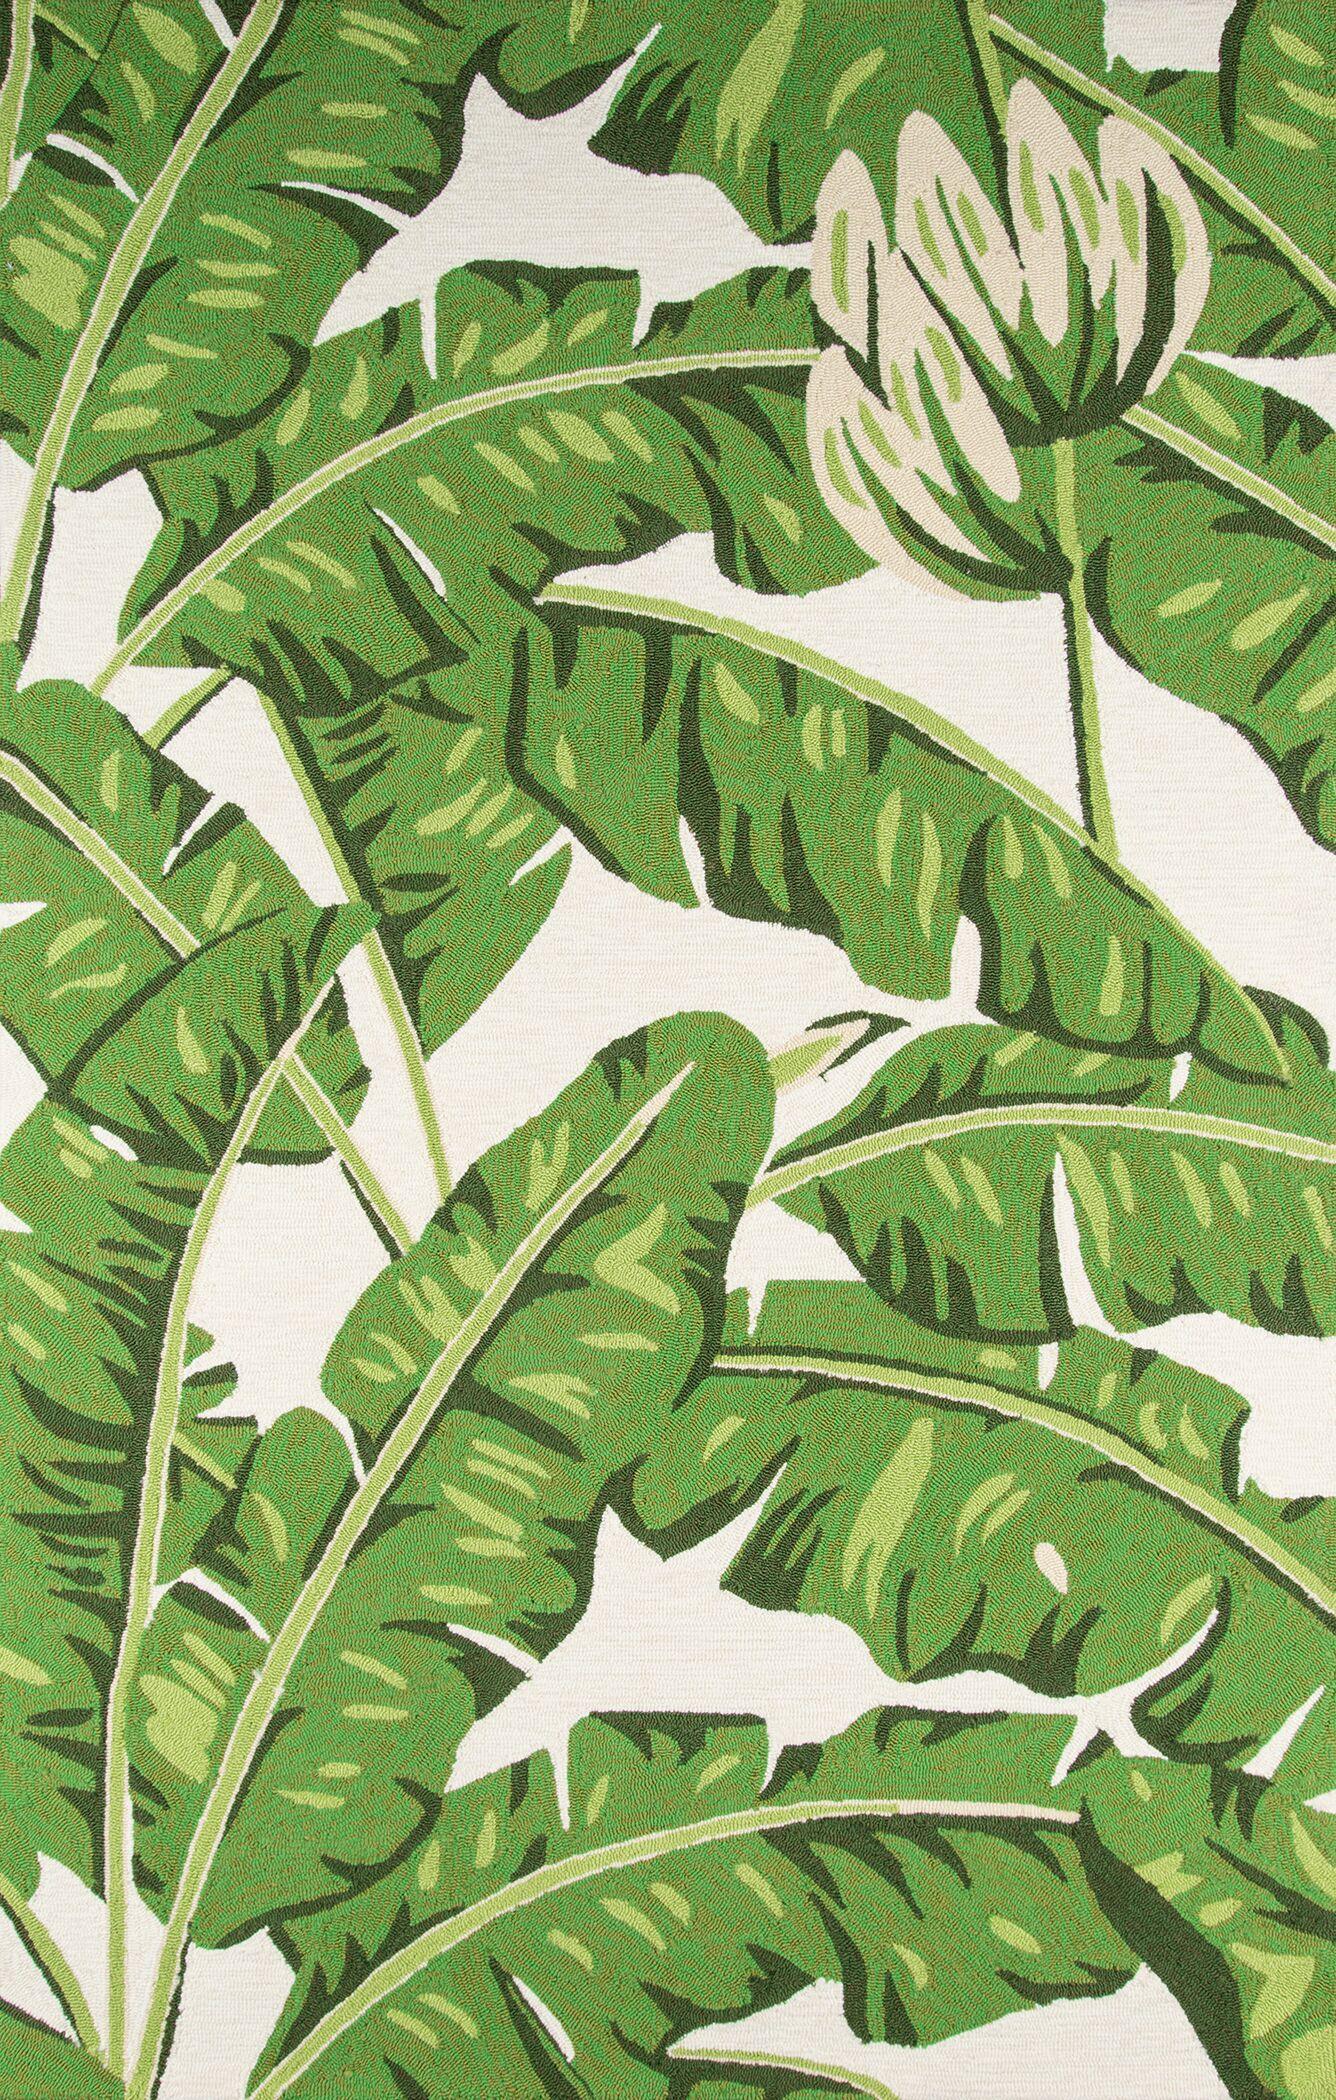 Zaliki Hand-Hooked Green Indoor/Outdoor Area Rug Rug Size: Round 9'